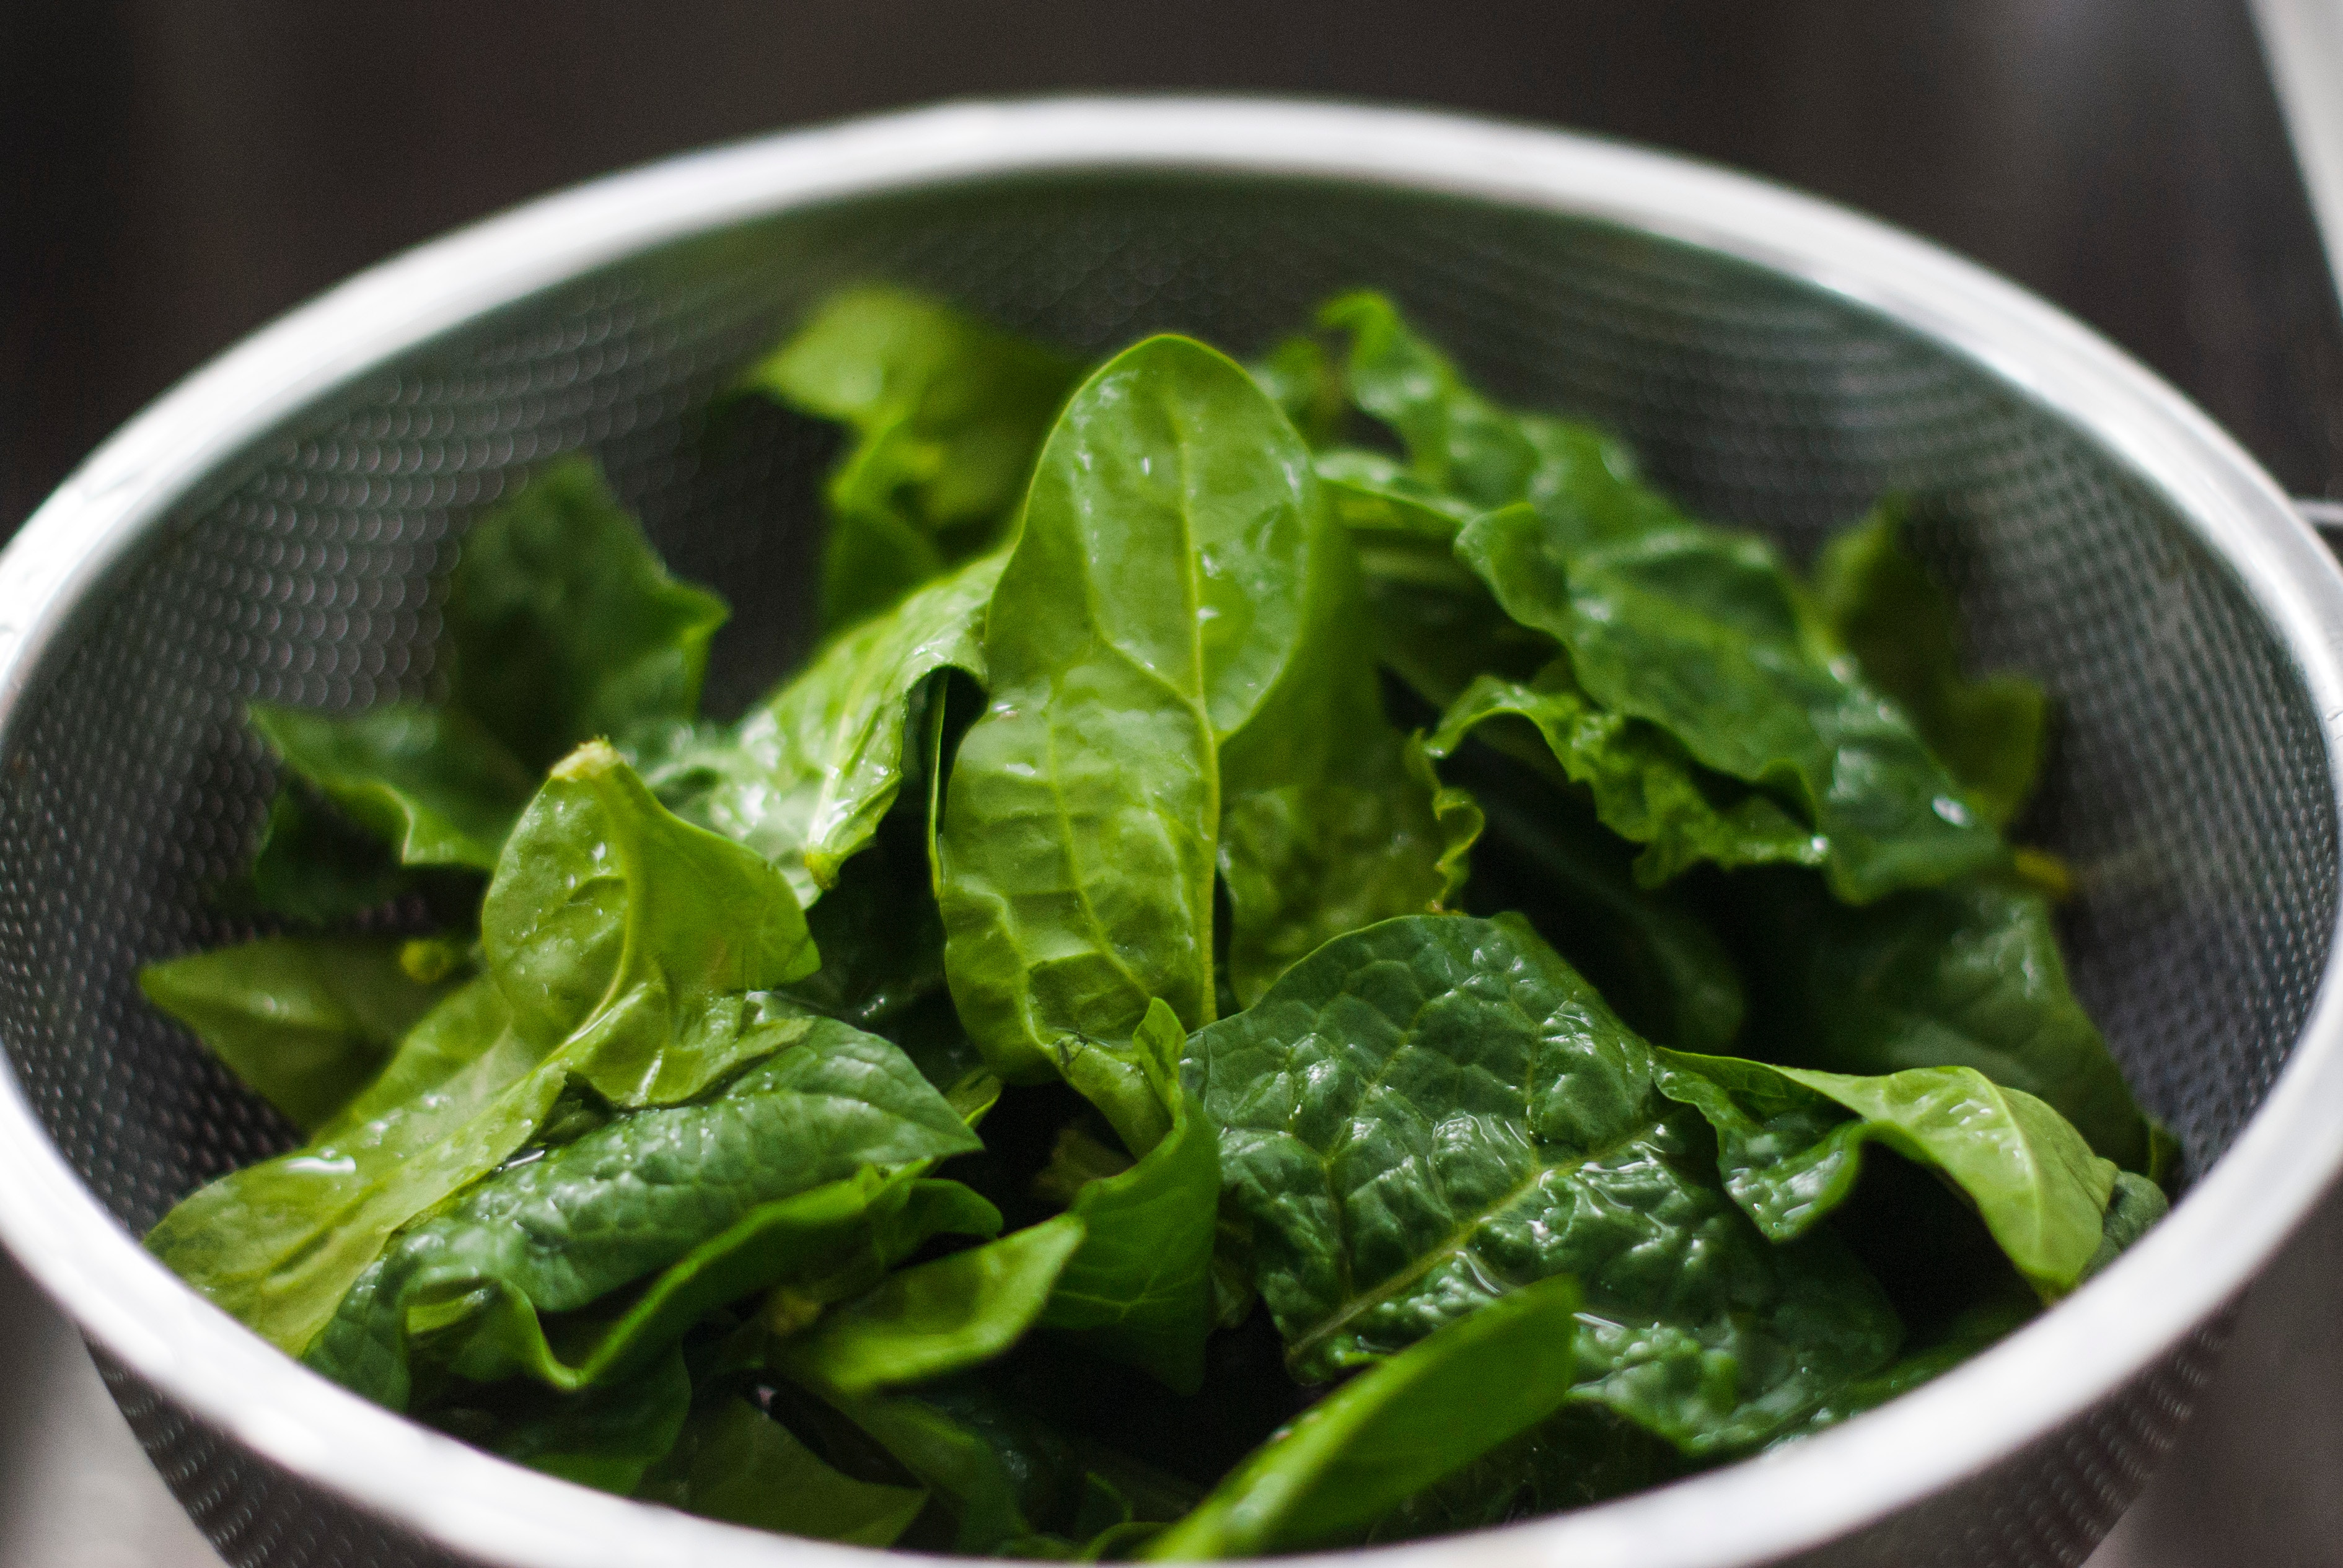 Image result for Leafy veggies